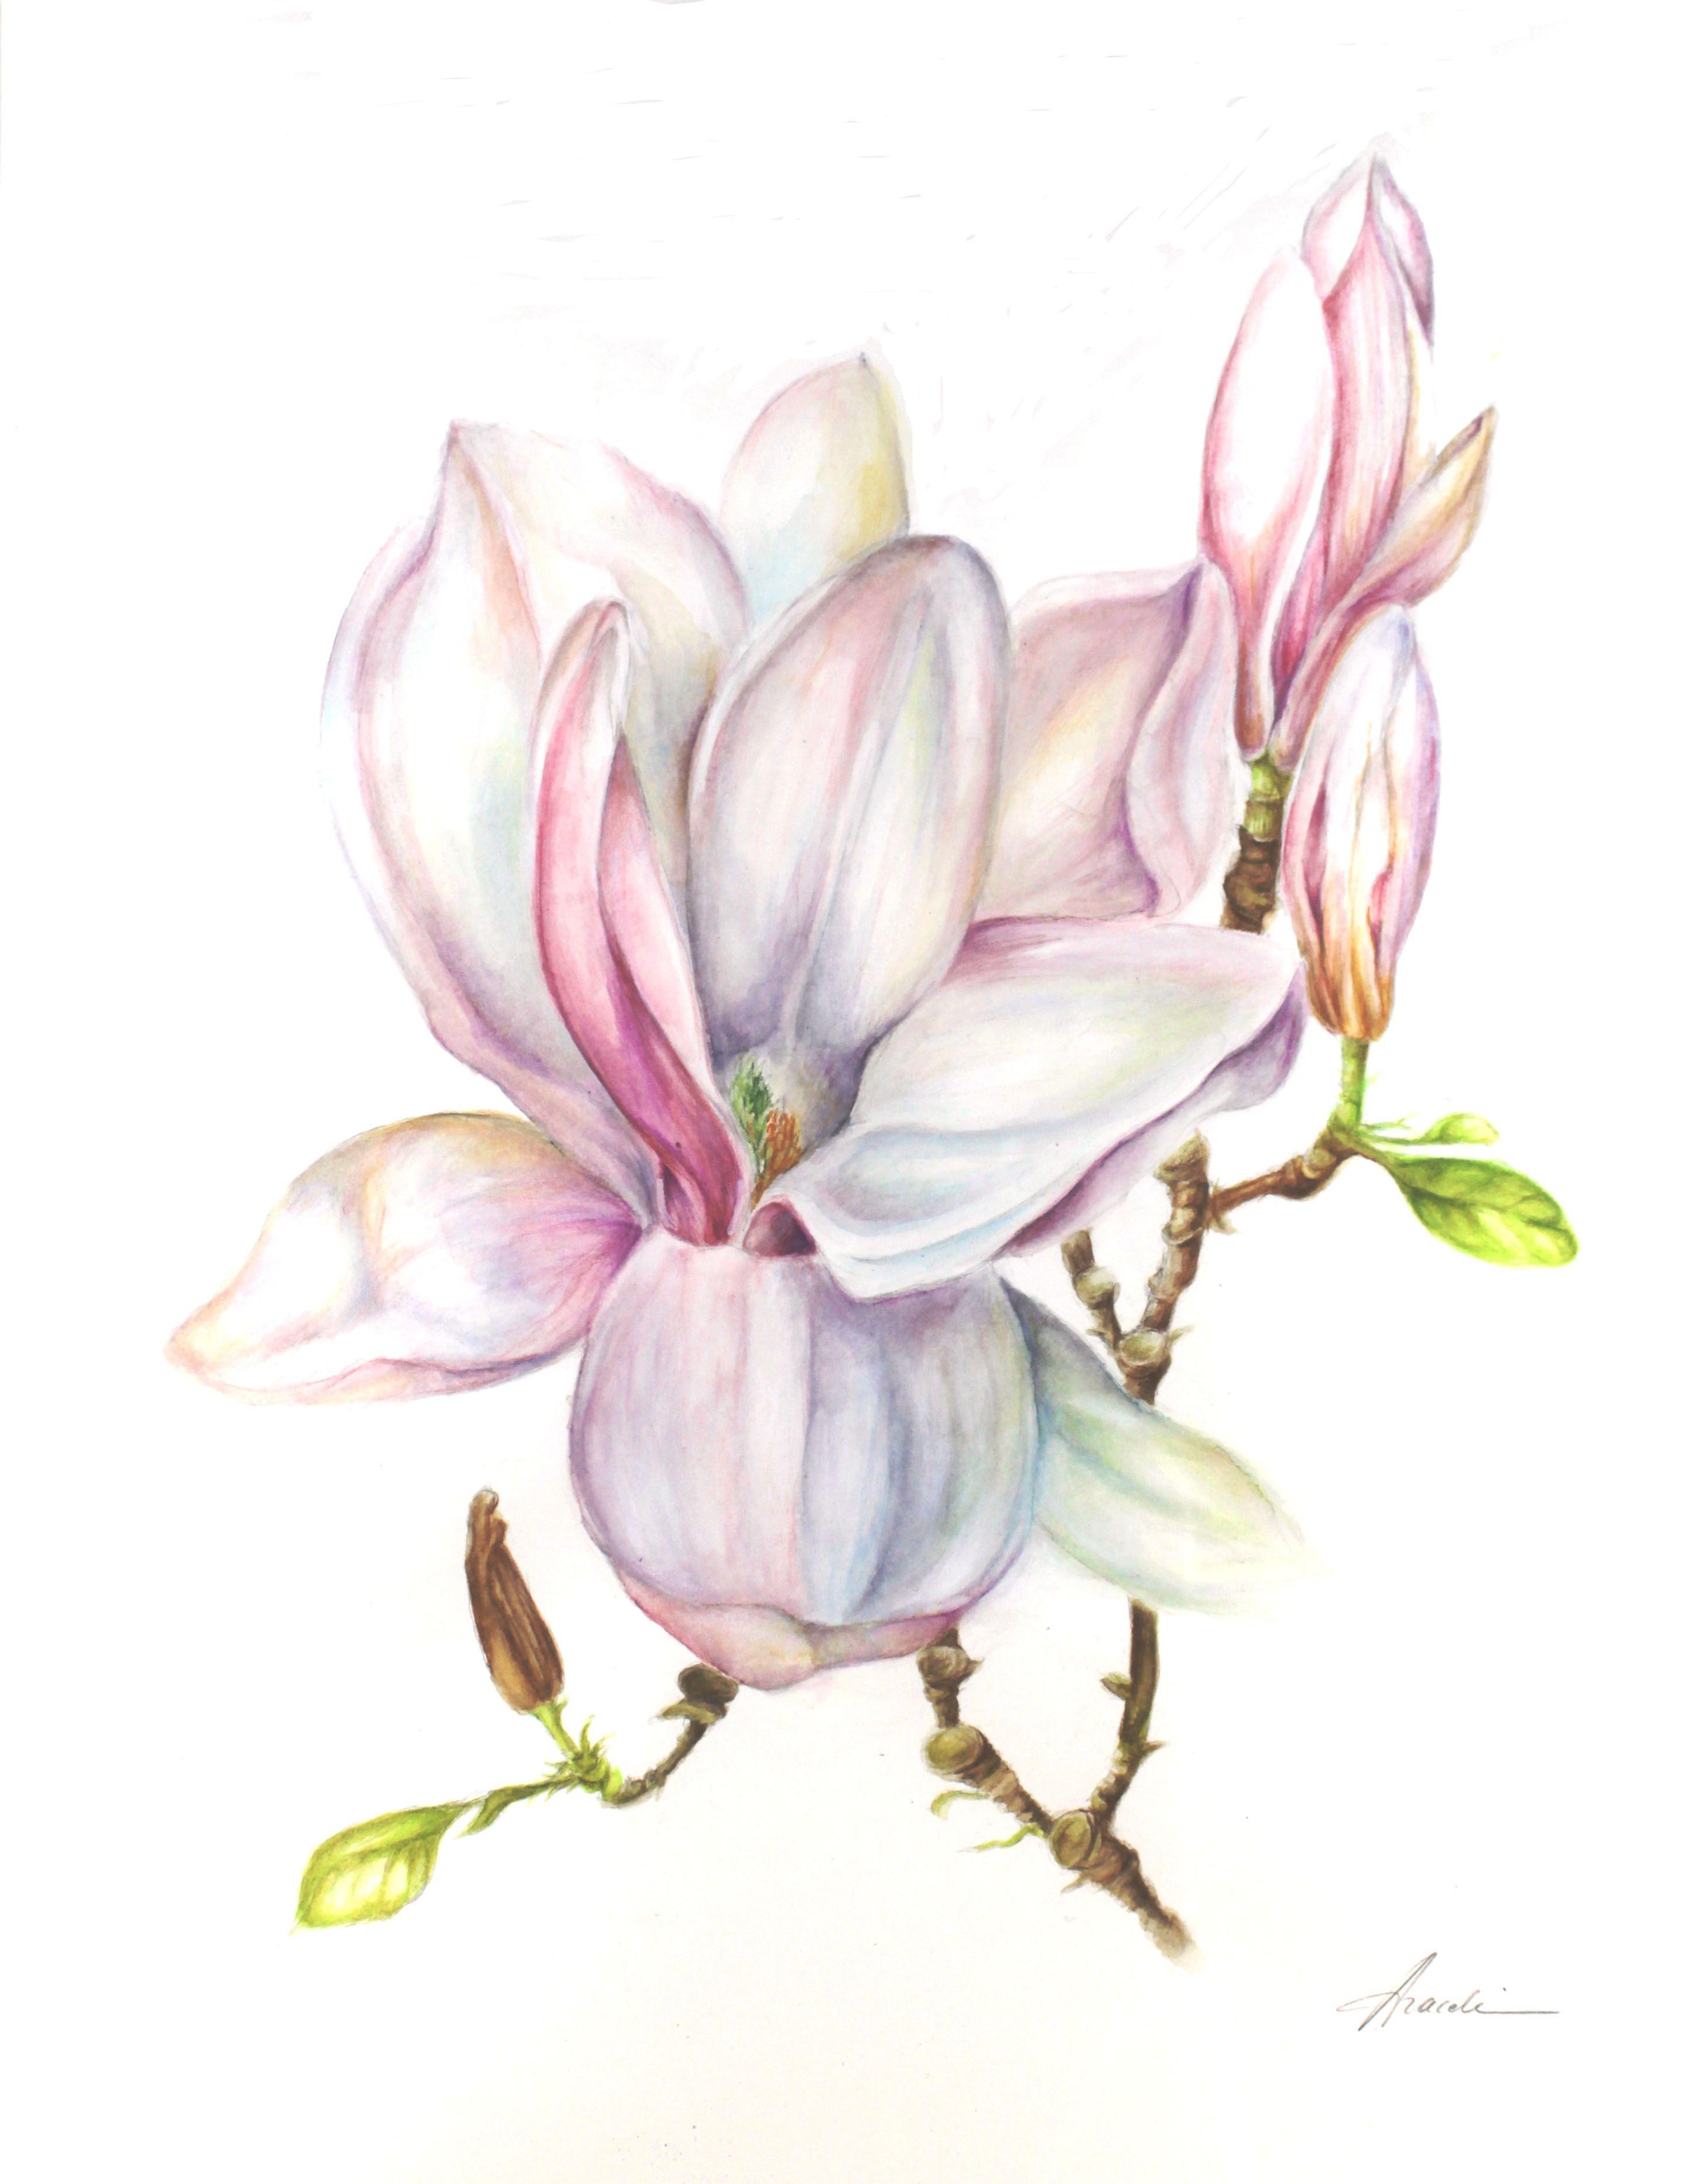 magnolia 50x70 cm watercolour www.aracelirequena.be